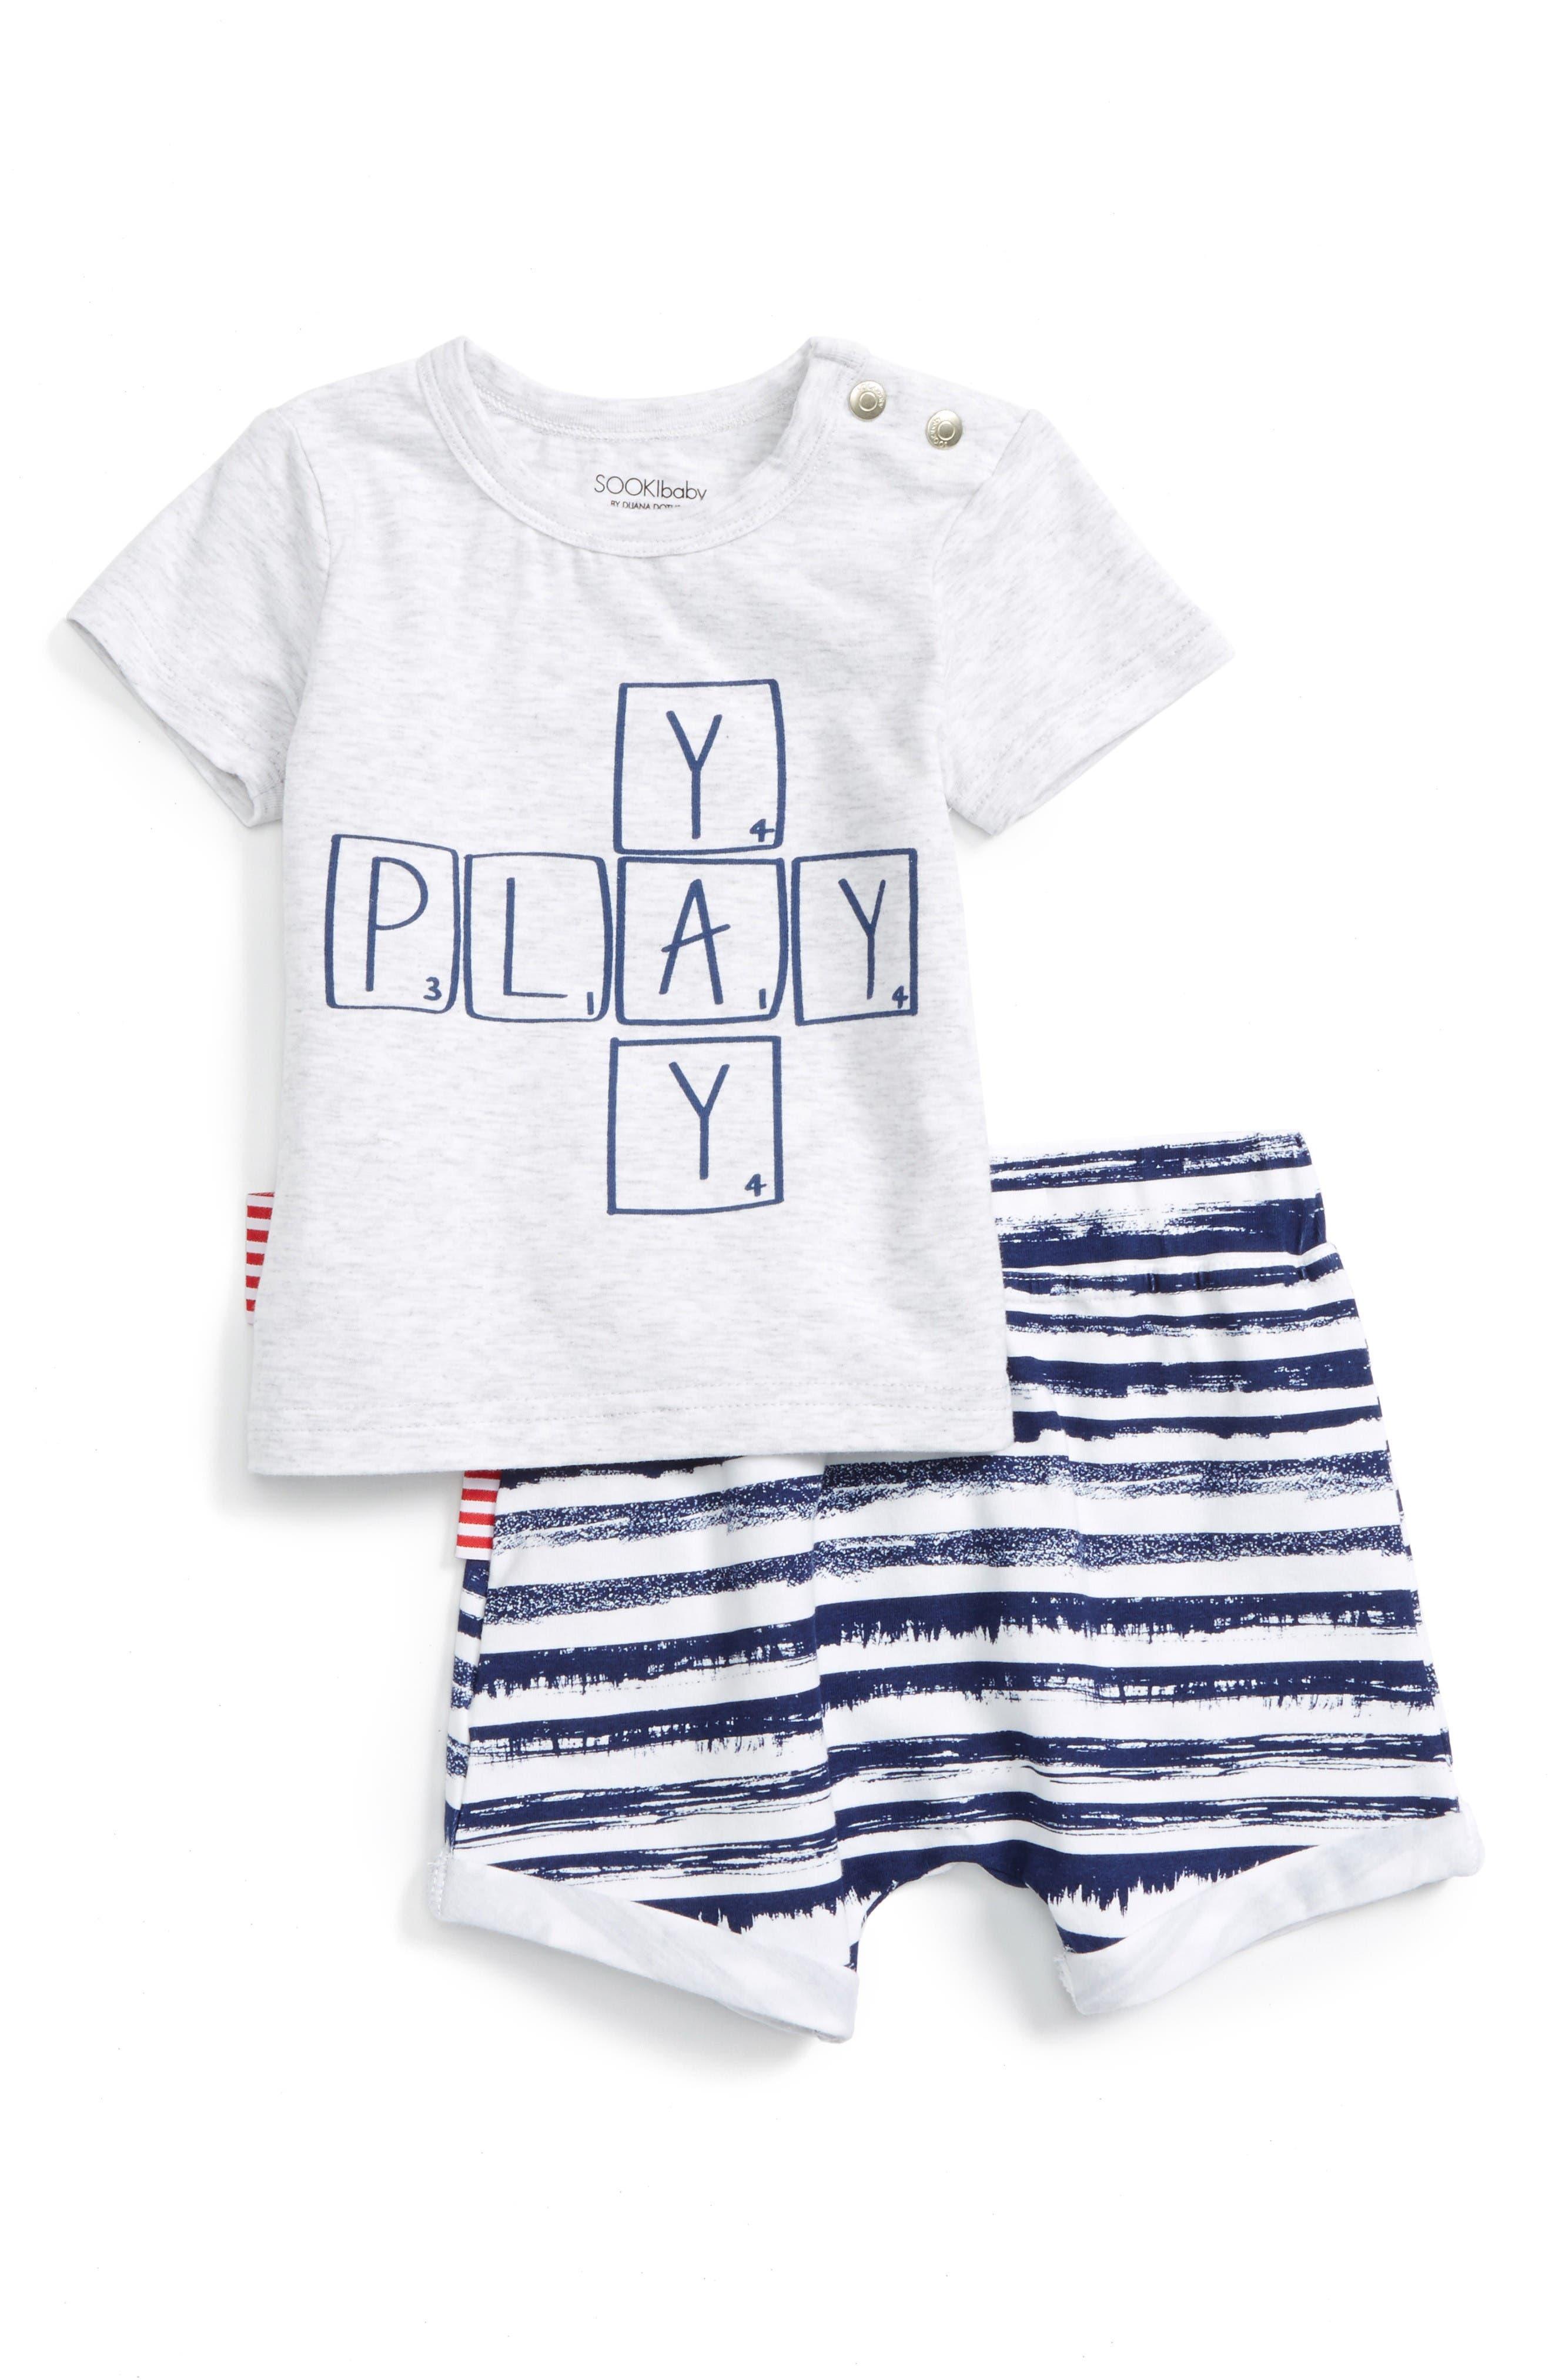 SOOKIbaby Play T-Shirt & Shorts Set (Baby & Toddler)